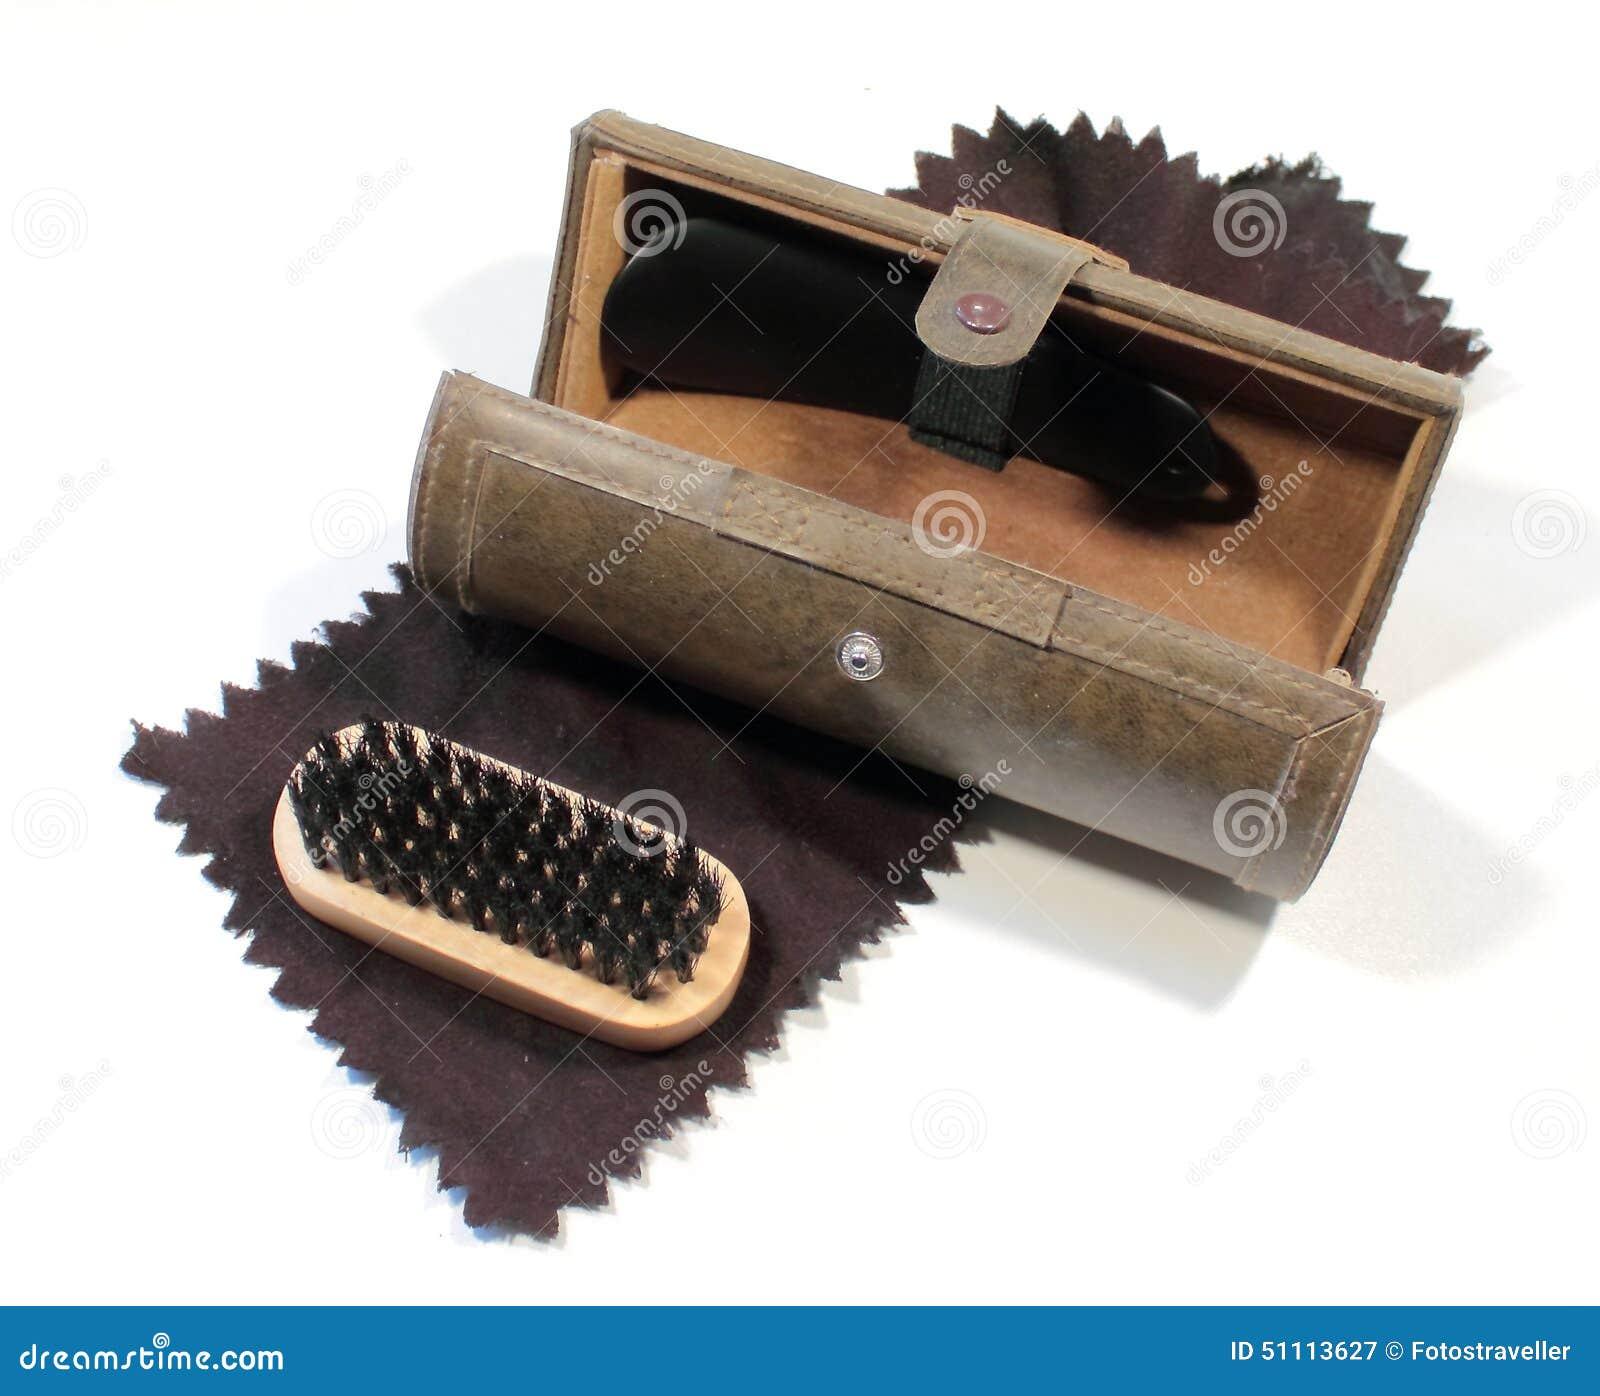 Antique Shoe Shine Box Royalty-Free Stock Photography ...